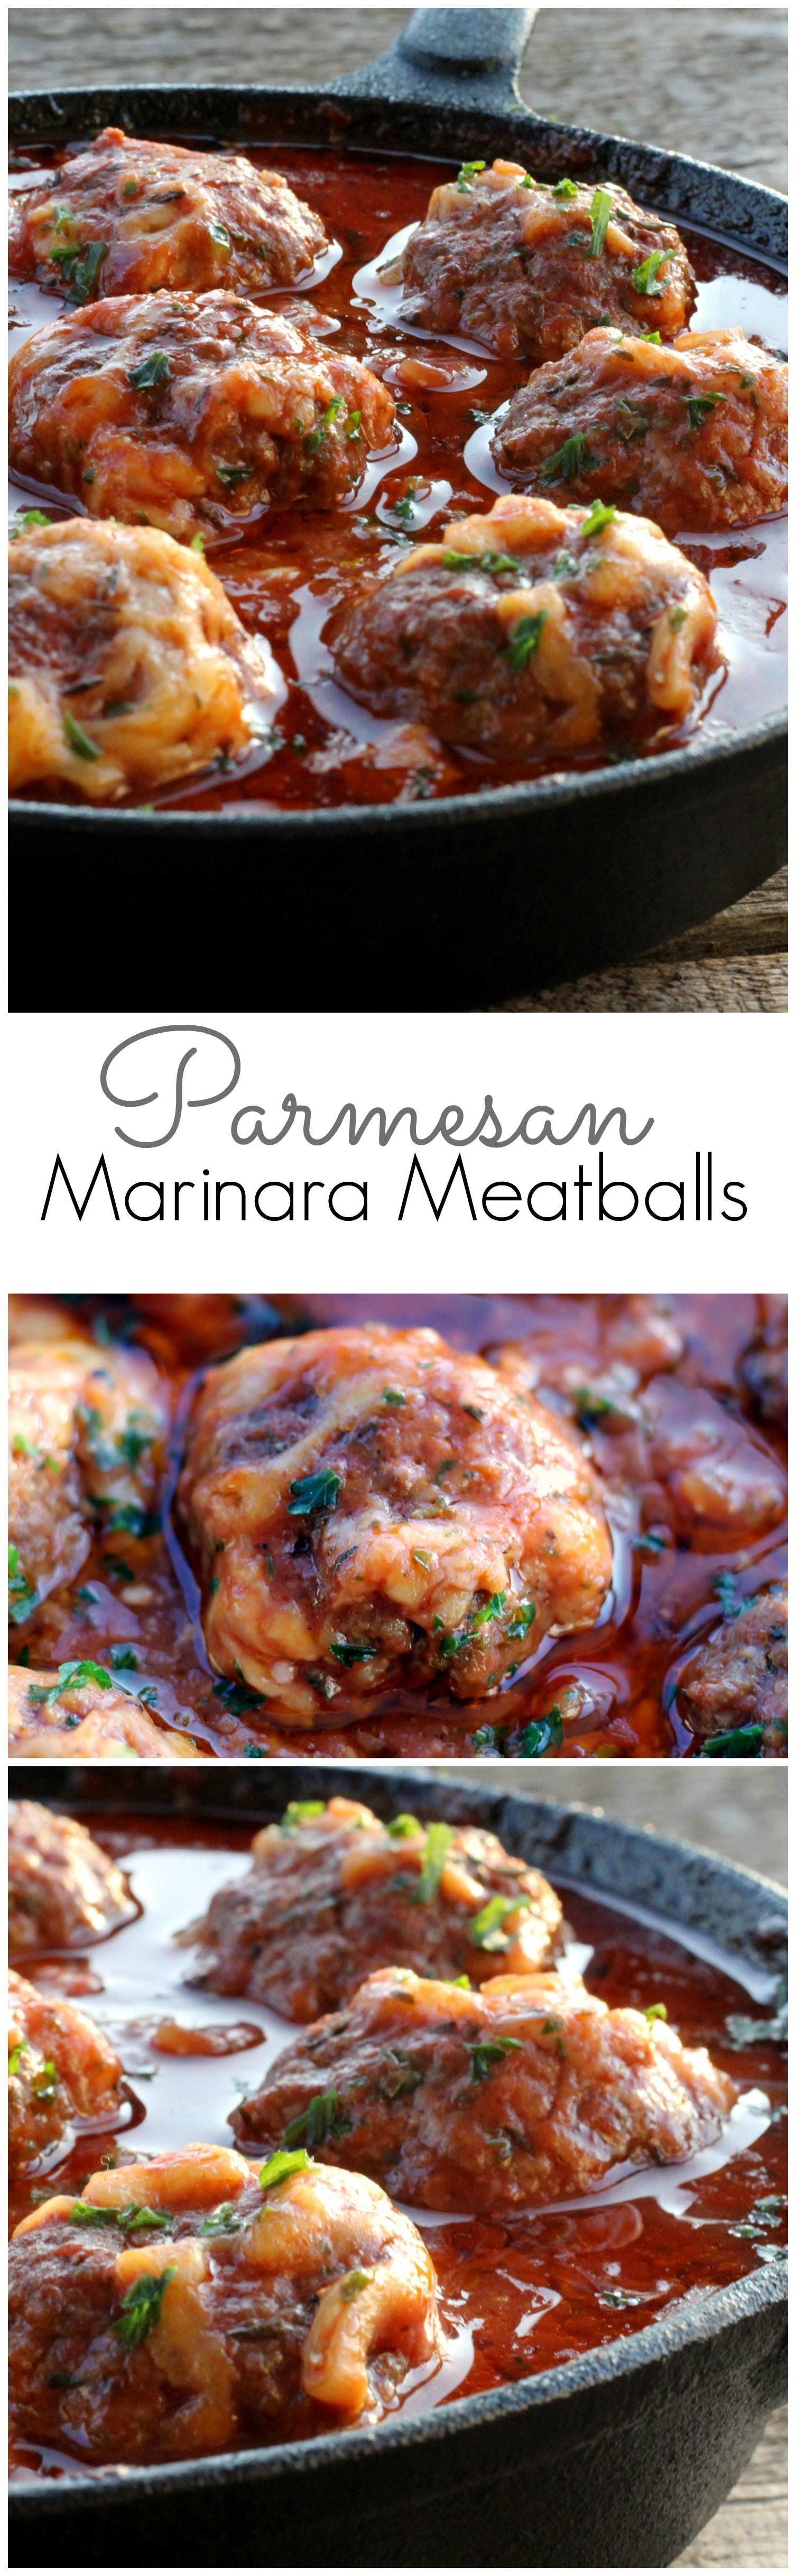 parmesan_marinara-meatballs